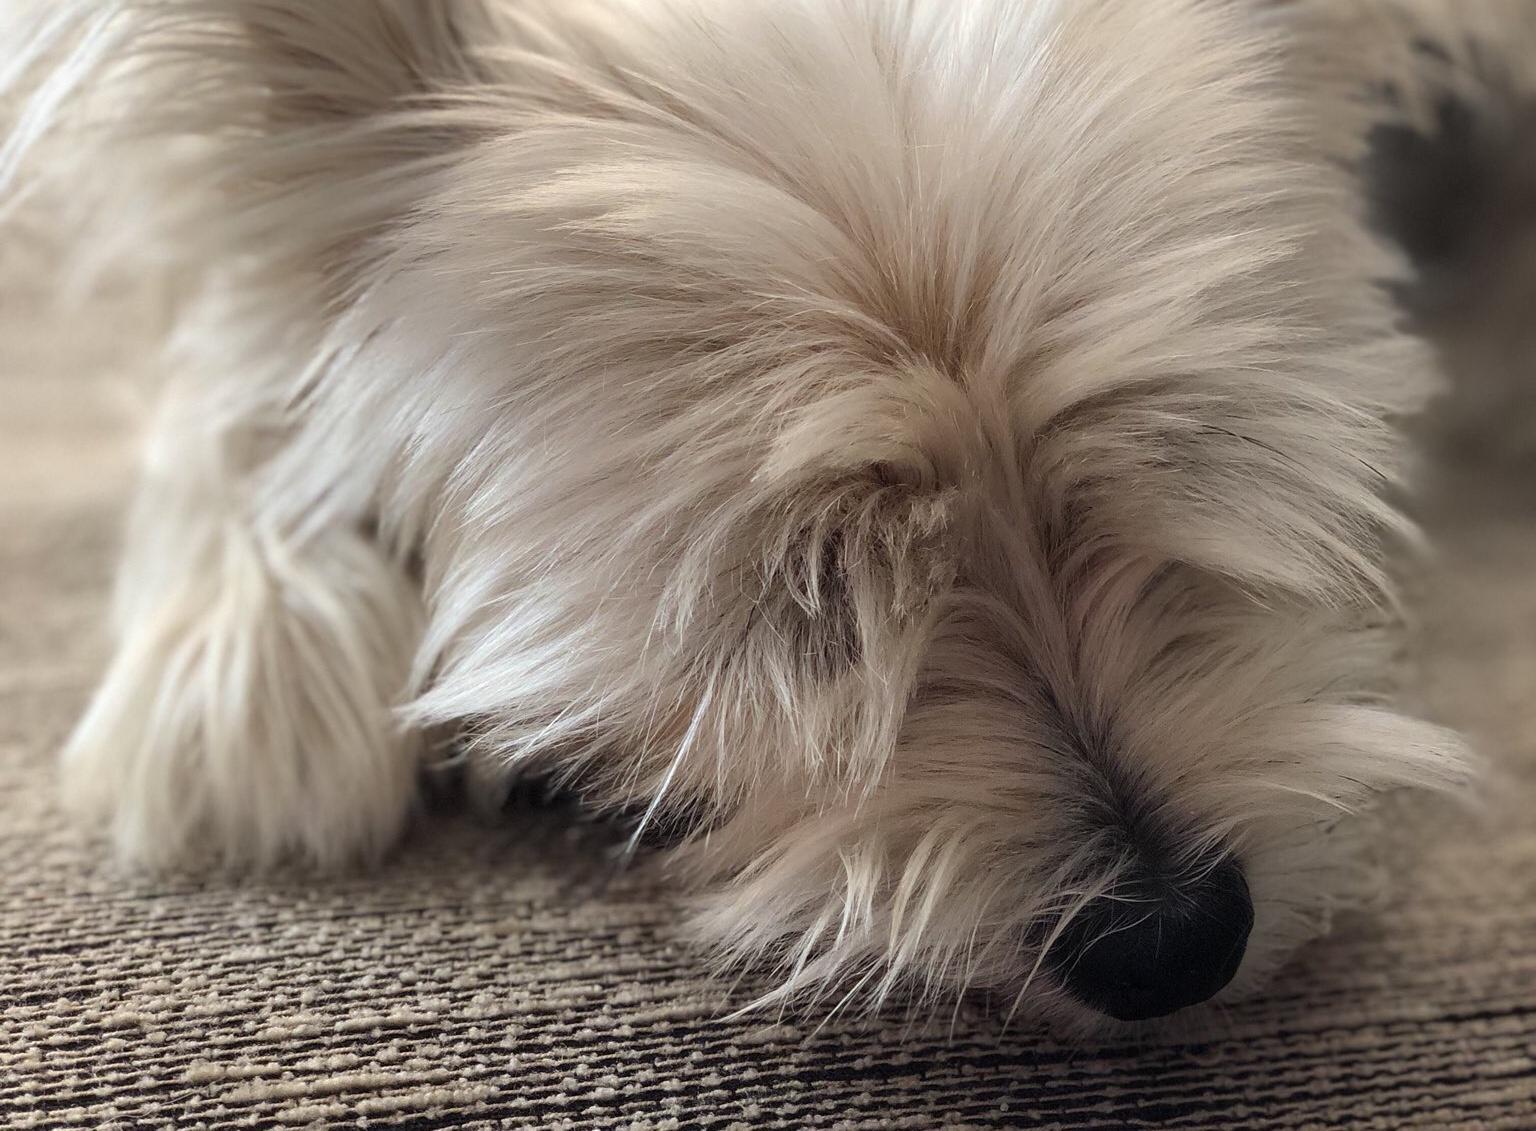 IPhone X Perro Twitter